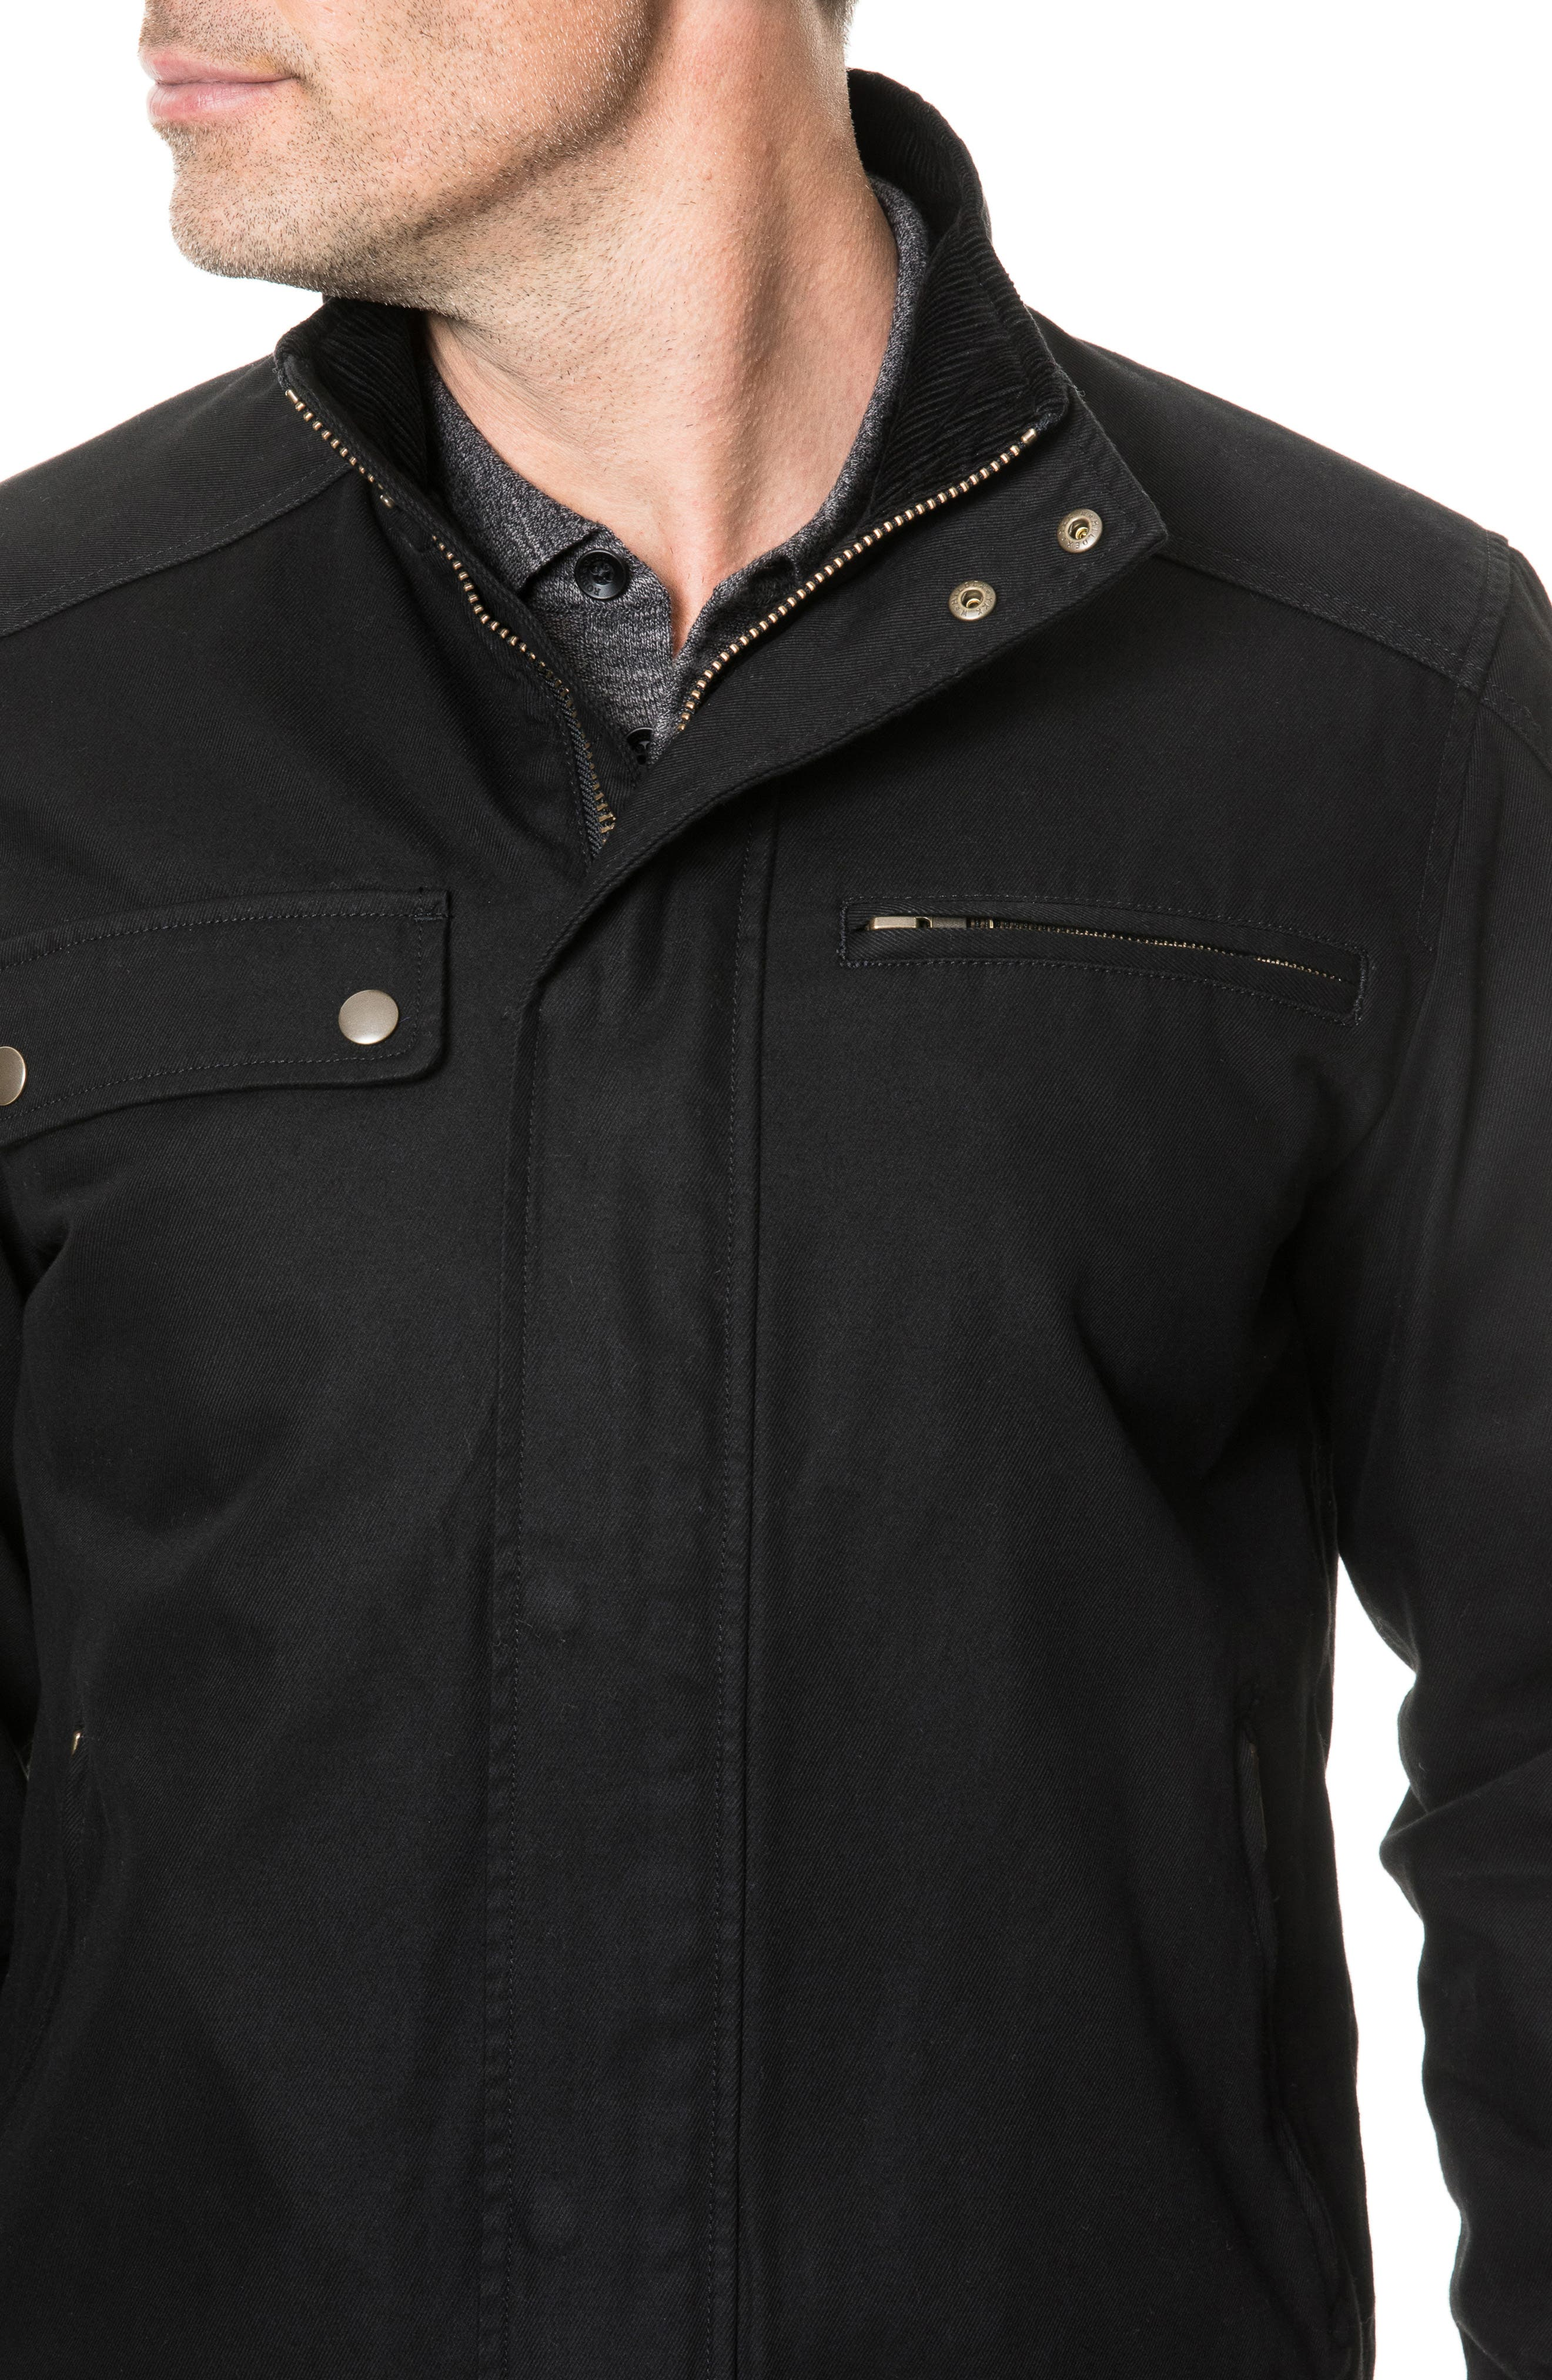 Campbell Point Jacket,                             Alternate thumbnail 3, color,                             NAVY